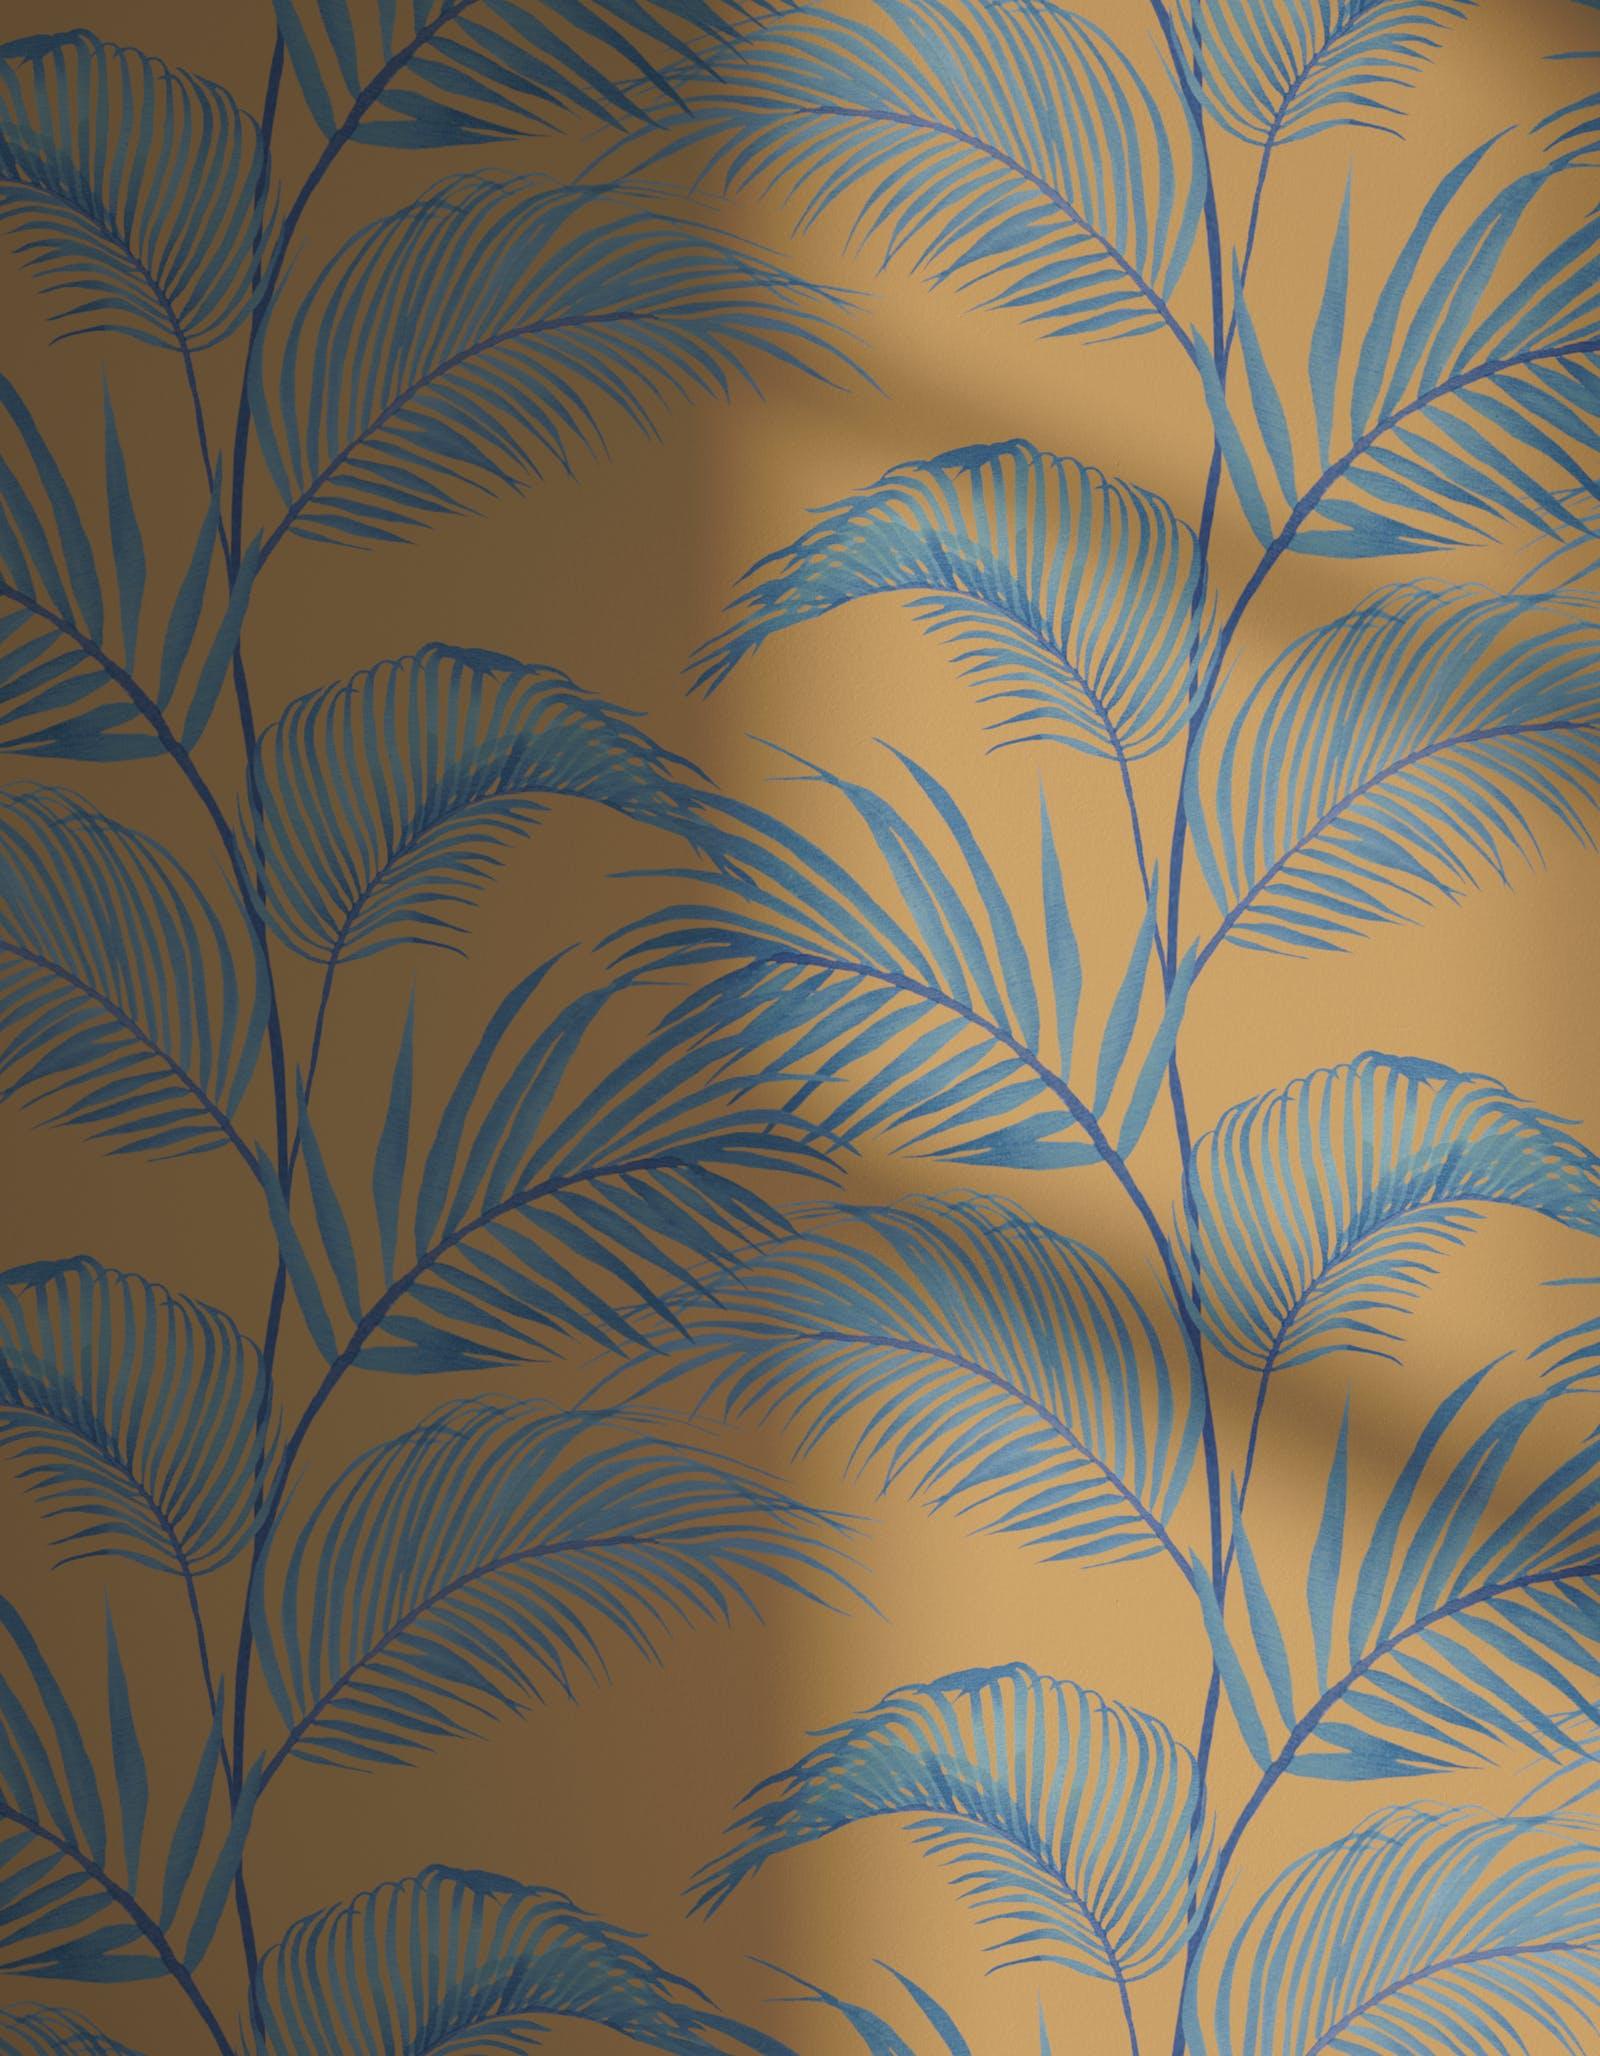 Lick x Belinda Bayley Jungle 01 orange palm leaf wallpaper with shadow